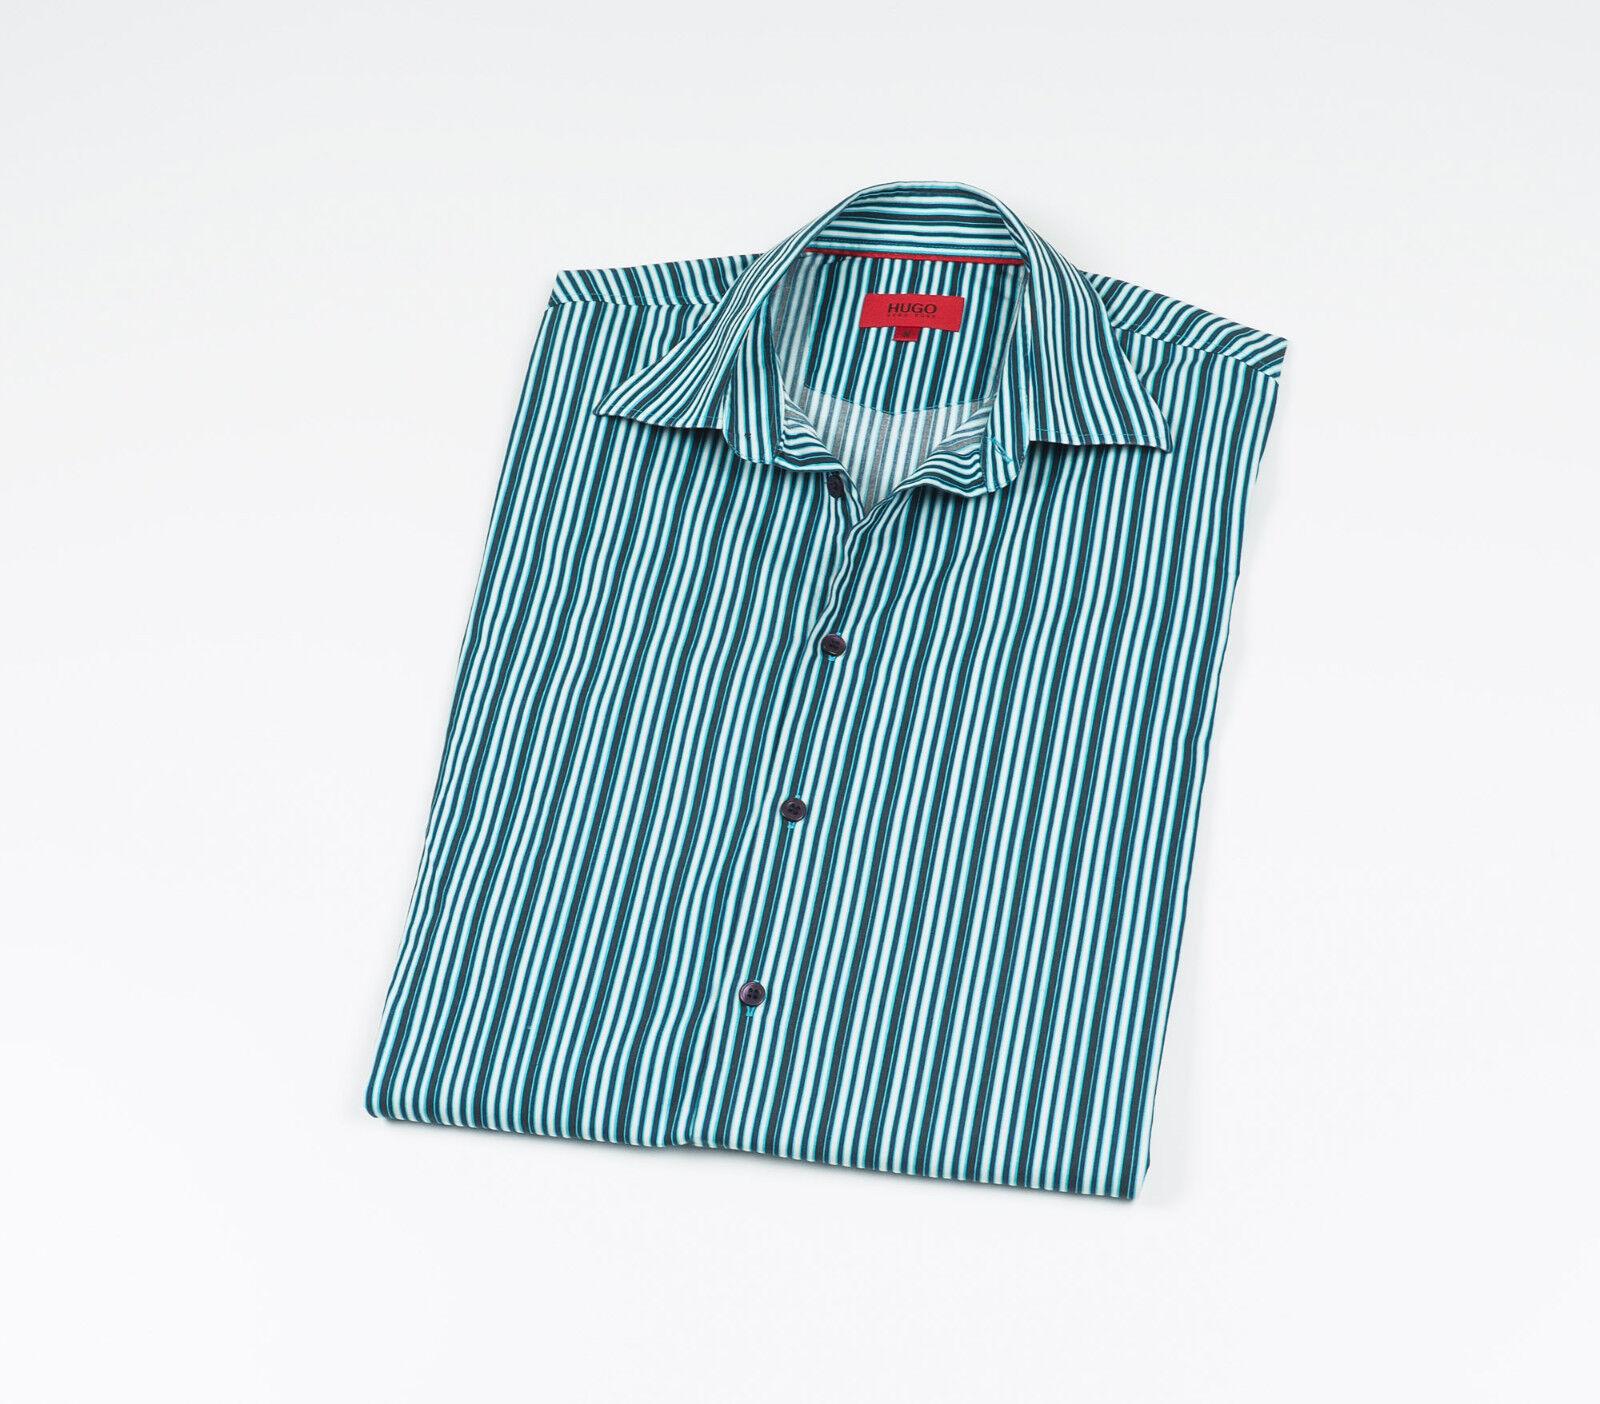 e7d002eb4 HUGO Hugo Boss Men's bluee striped long sleeved Casual Shirt Size Medium  nwosvc2989-Casual Button-Down Shirts